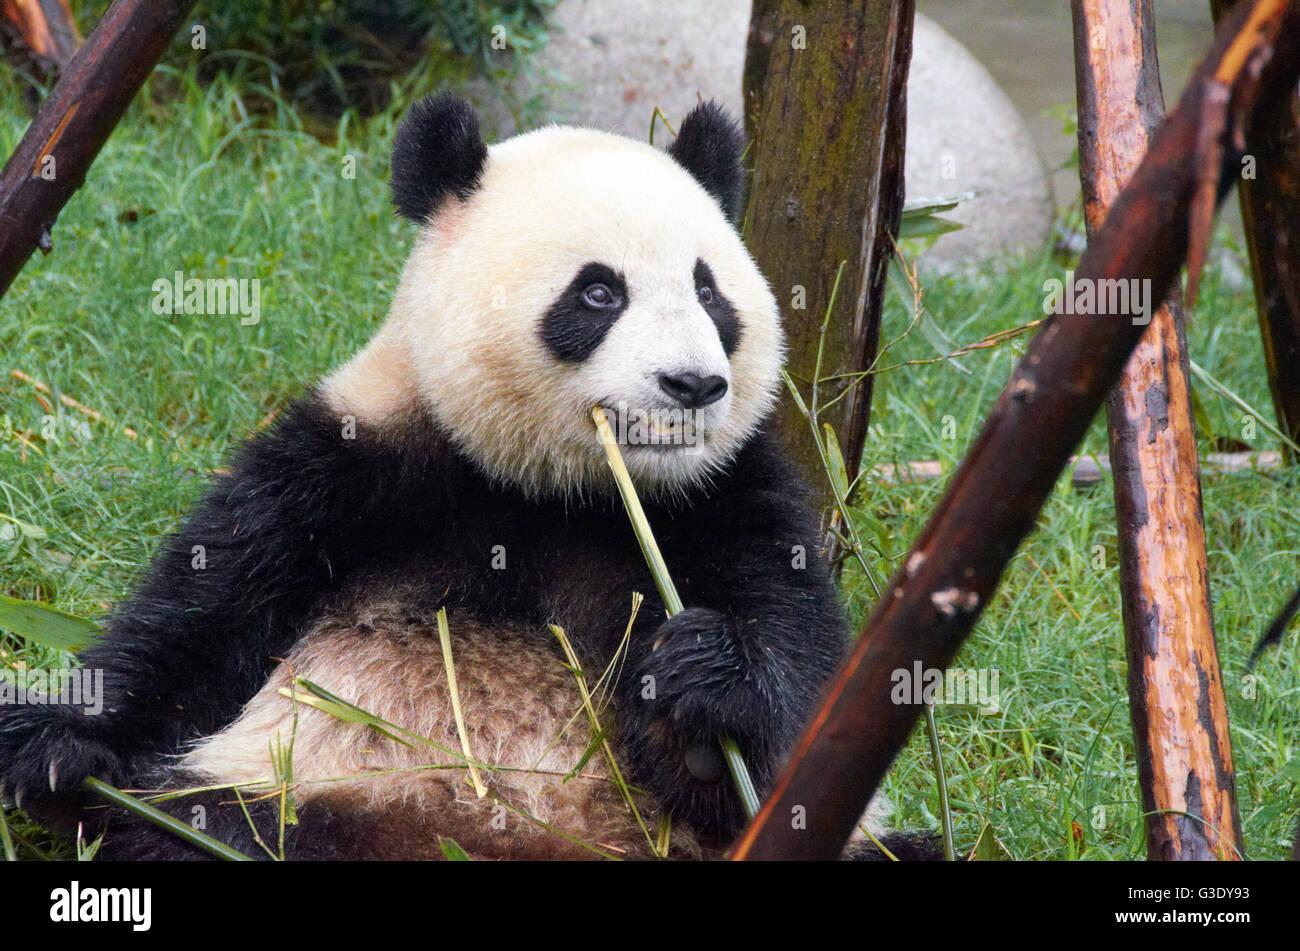 Panda bear at Chengdu Research Base of Giant Panda Breeding - Stock Image